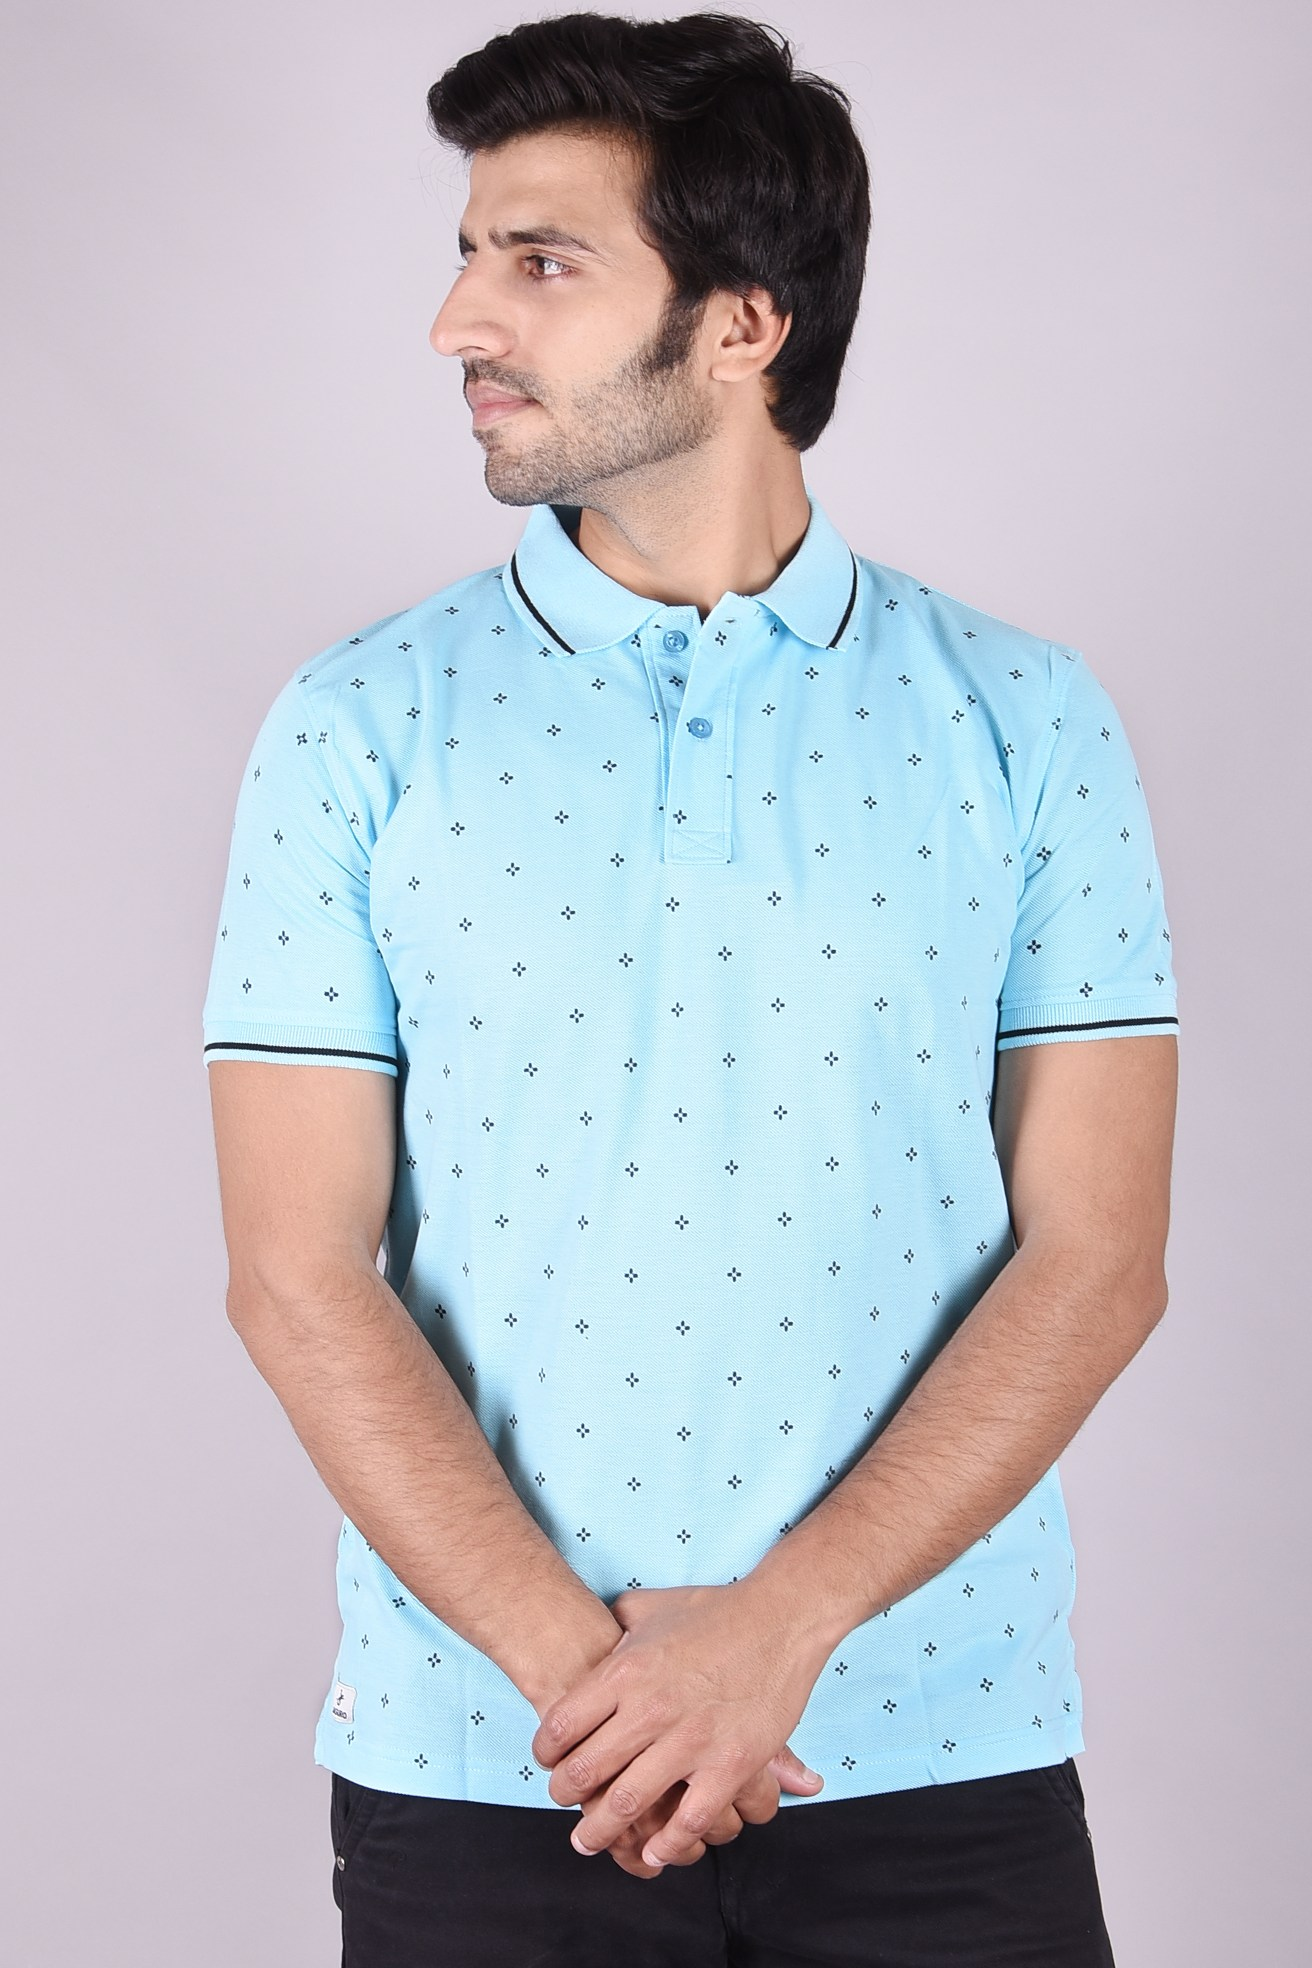 JAGURO   Stylish casual Printed cotton collar T-shirt.